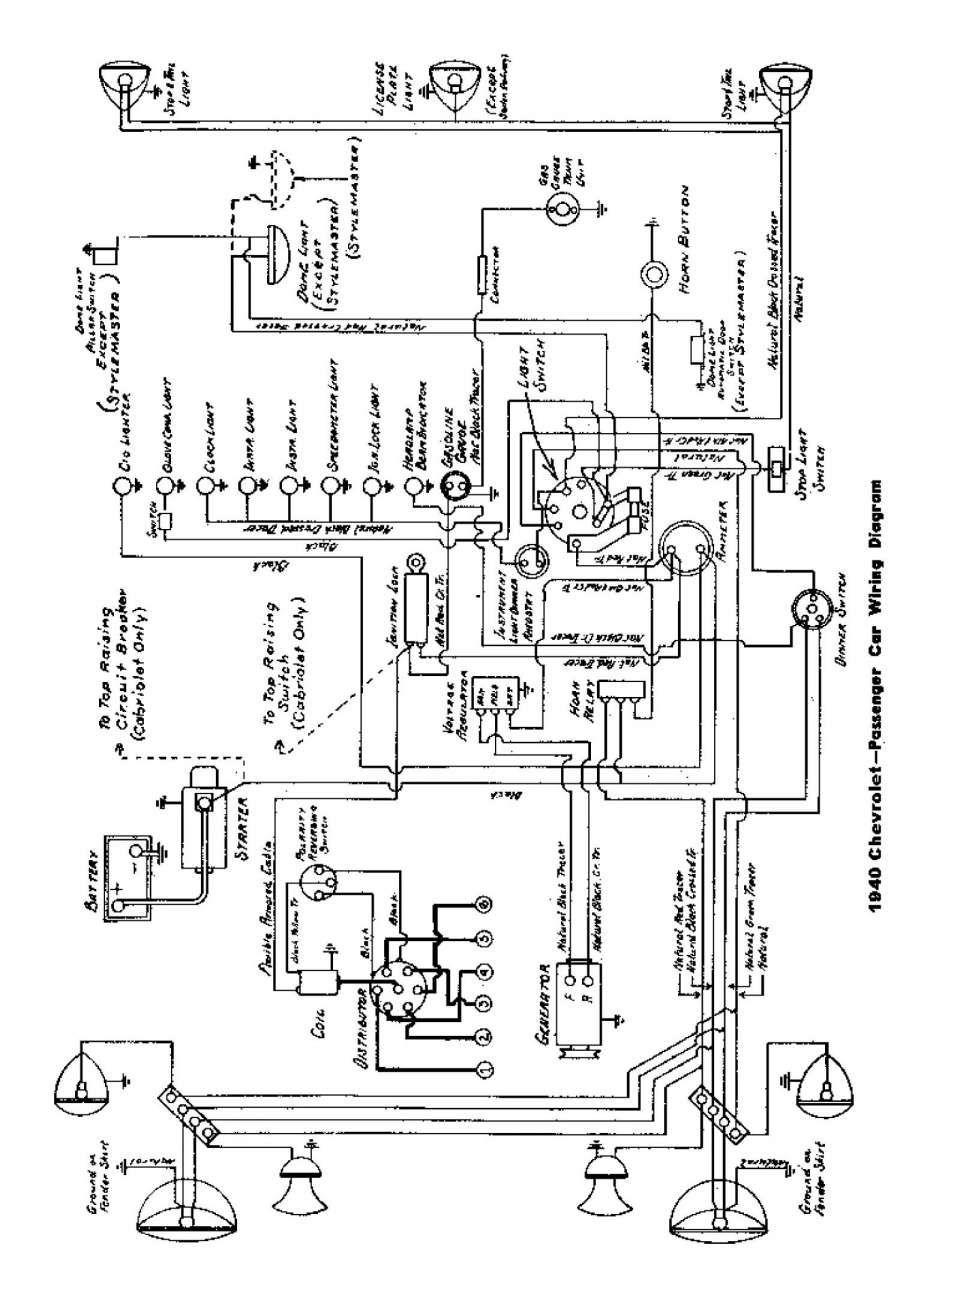 Pin on Diagram design